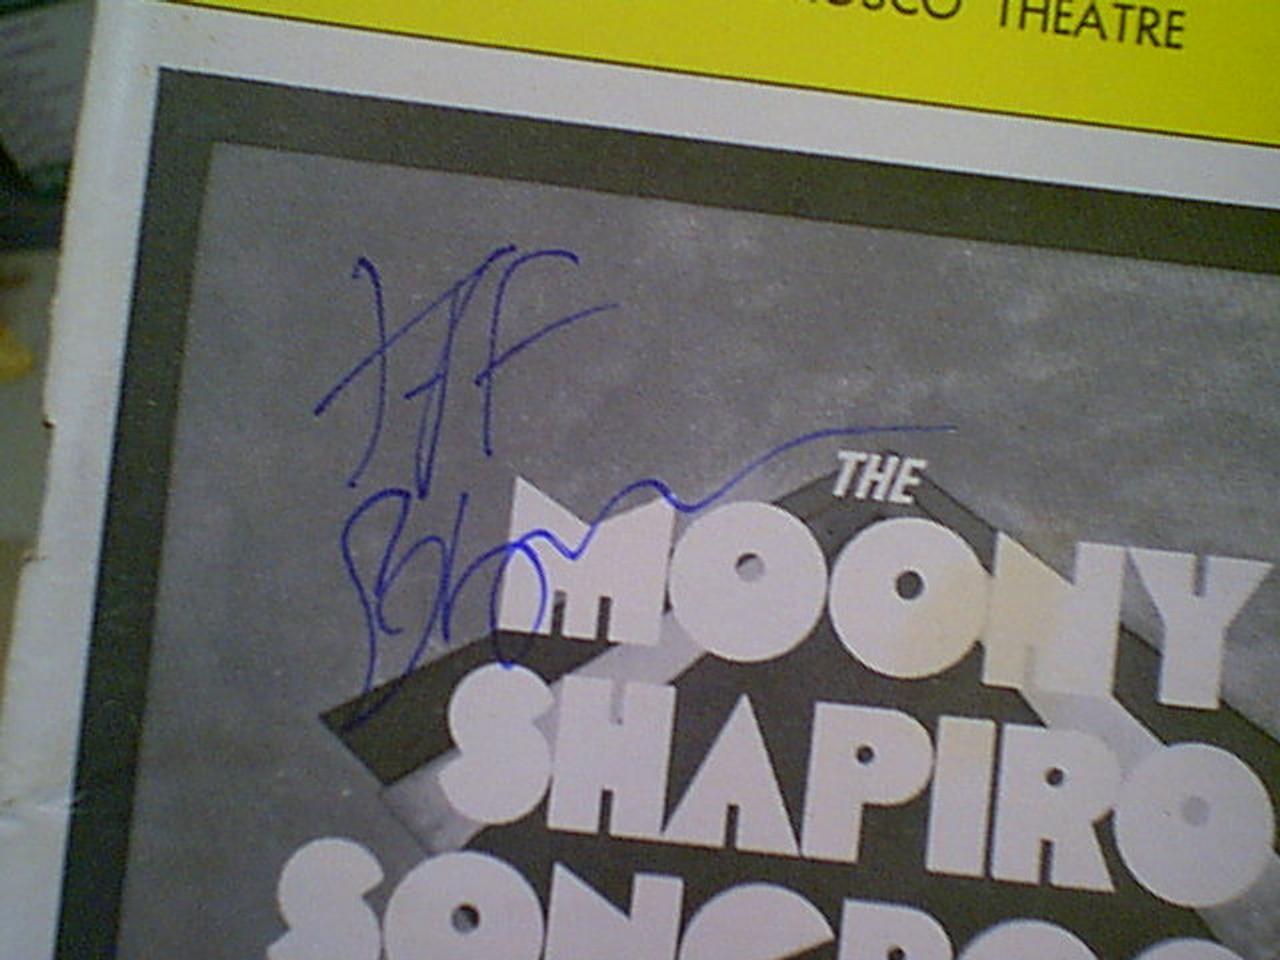 "Goldblum, Jeff ""The Moony Shapiro Songbook"" 1981 Playbill Signed Autograph"